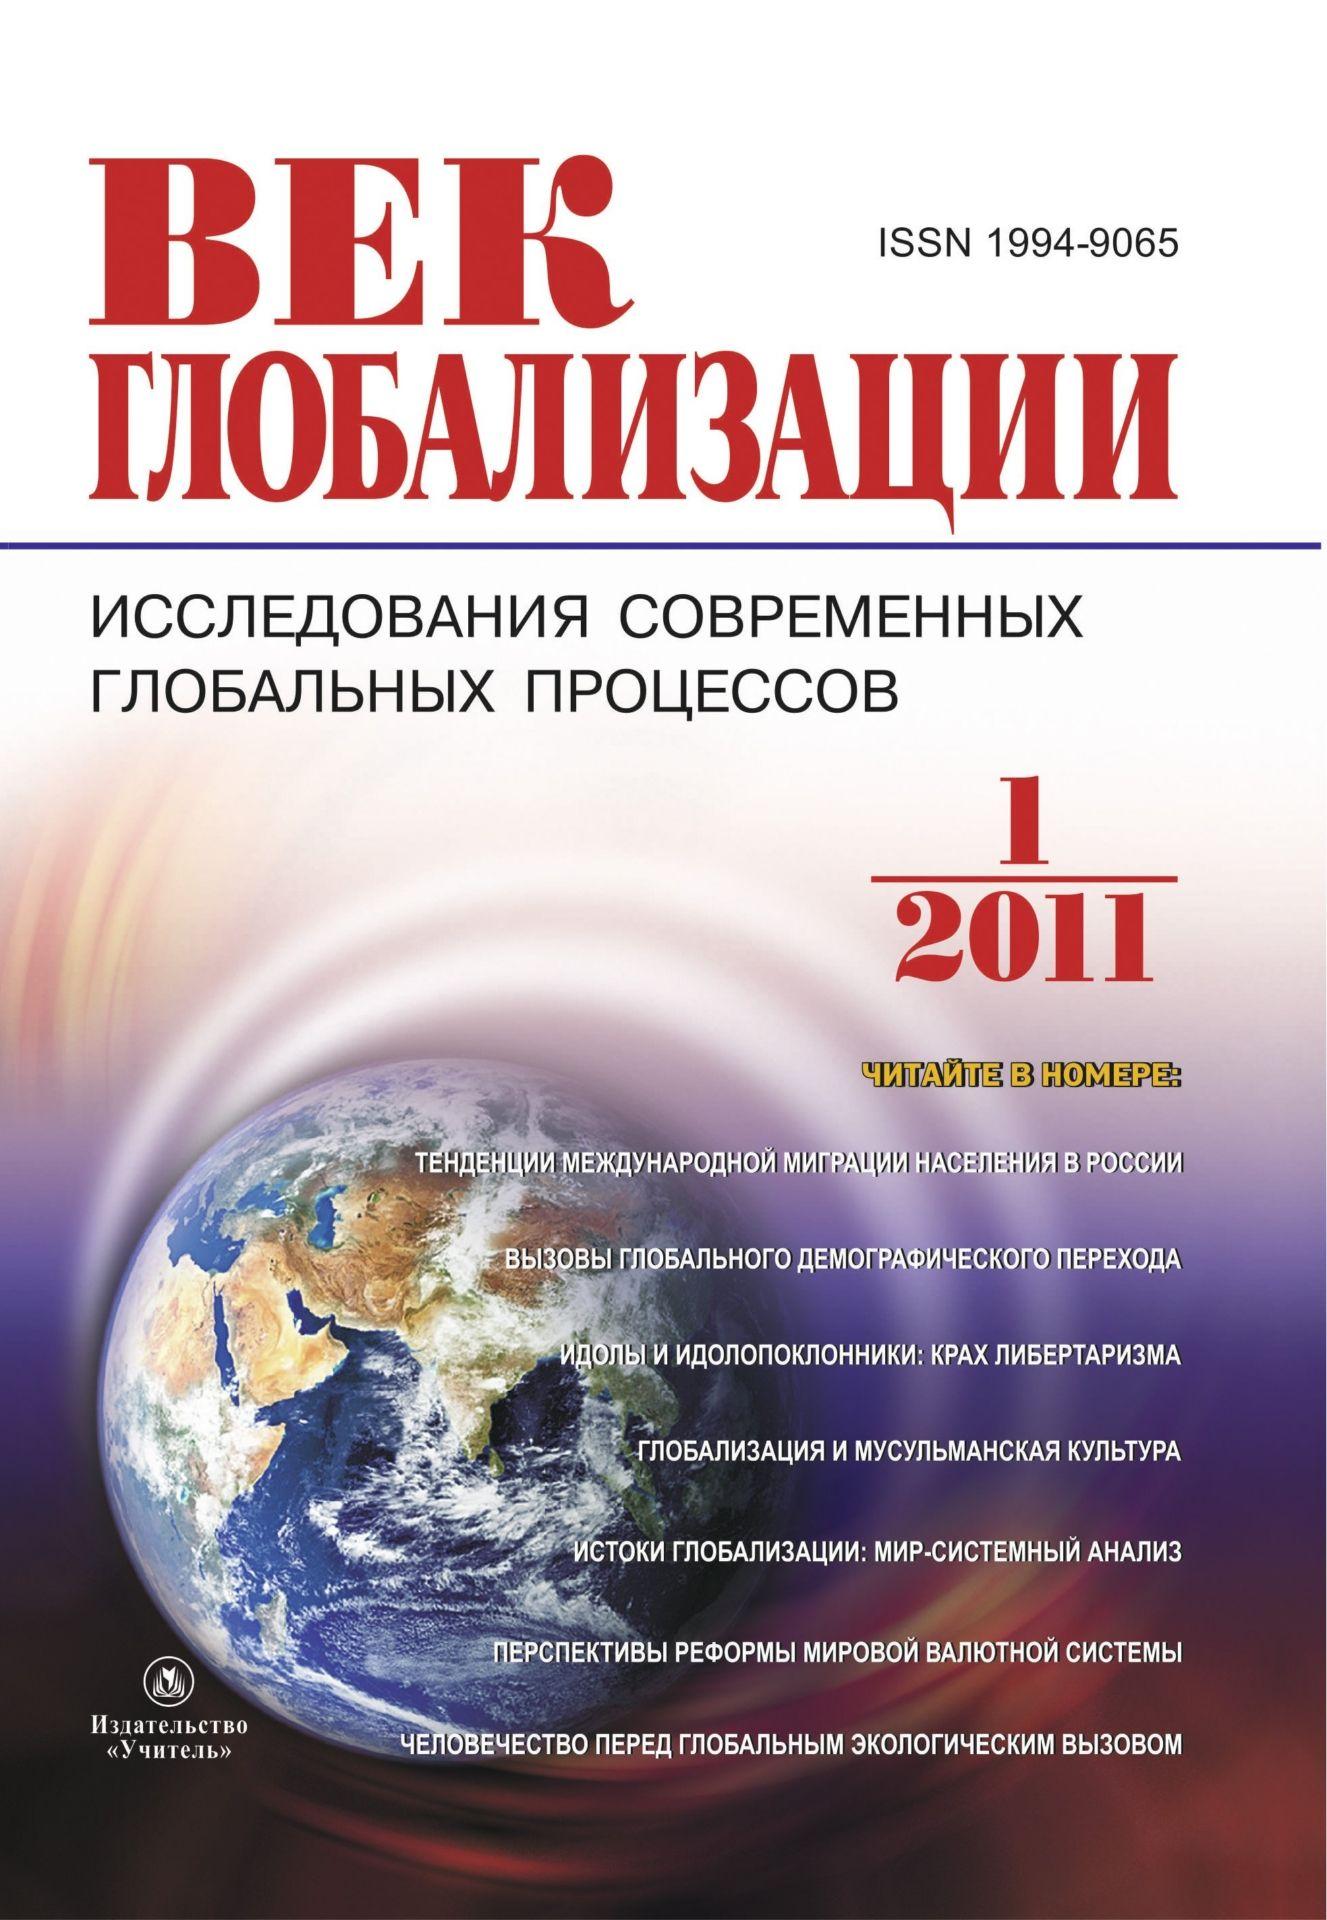 Журнал Век глобализации № 1 2011